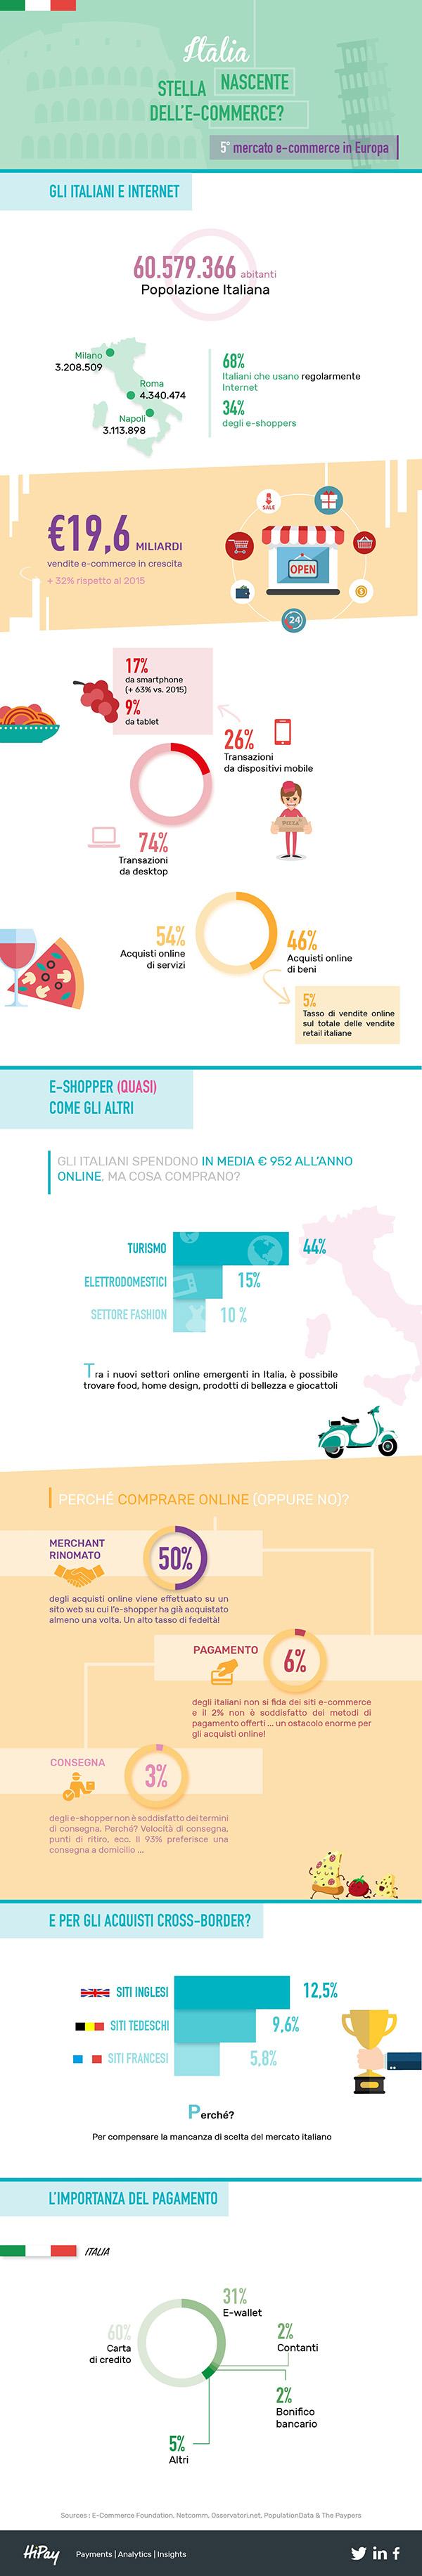 ecommerce in italia